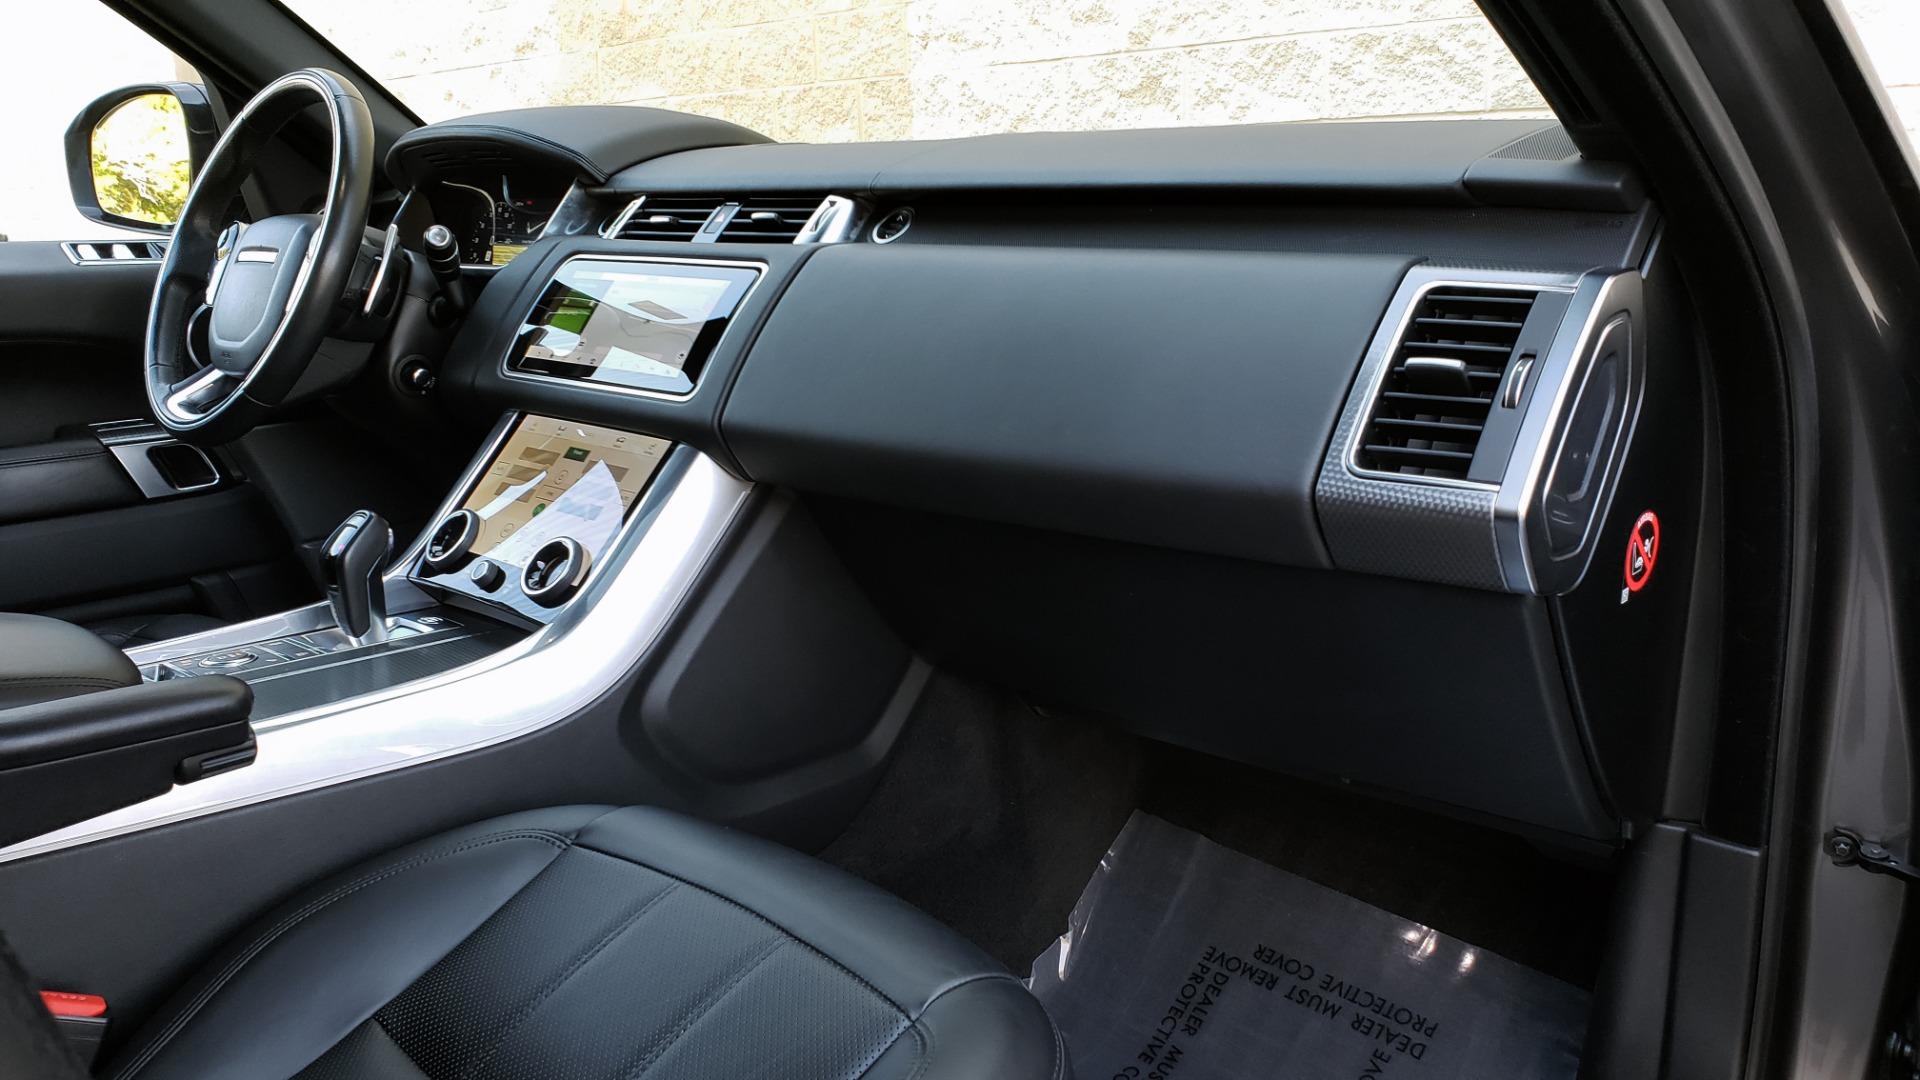 Used 2018 Land Rover RANGE ROVER SPORT DYNAMIC SC V8 / CLIMATE CMFRT / VISION ASST / MERIDIAN for sale Sold at Formula Imports in Charlotte NC 28227 80